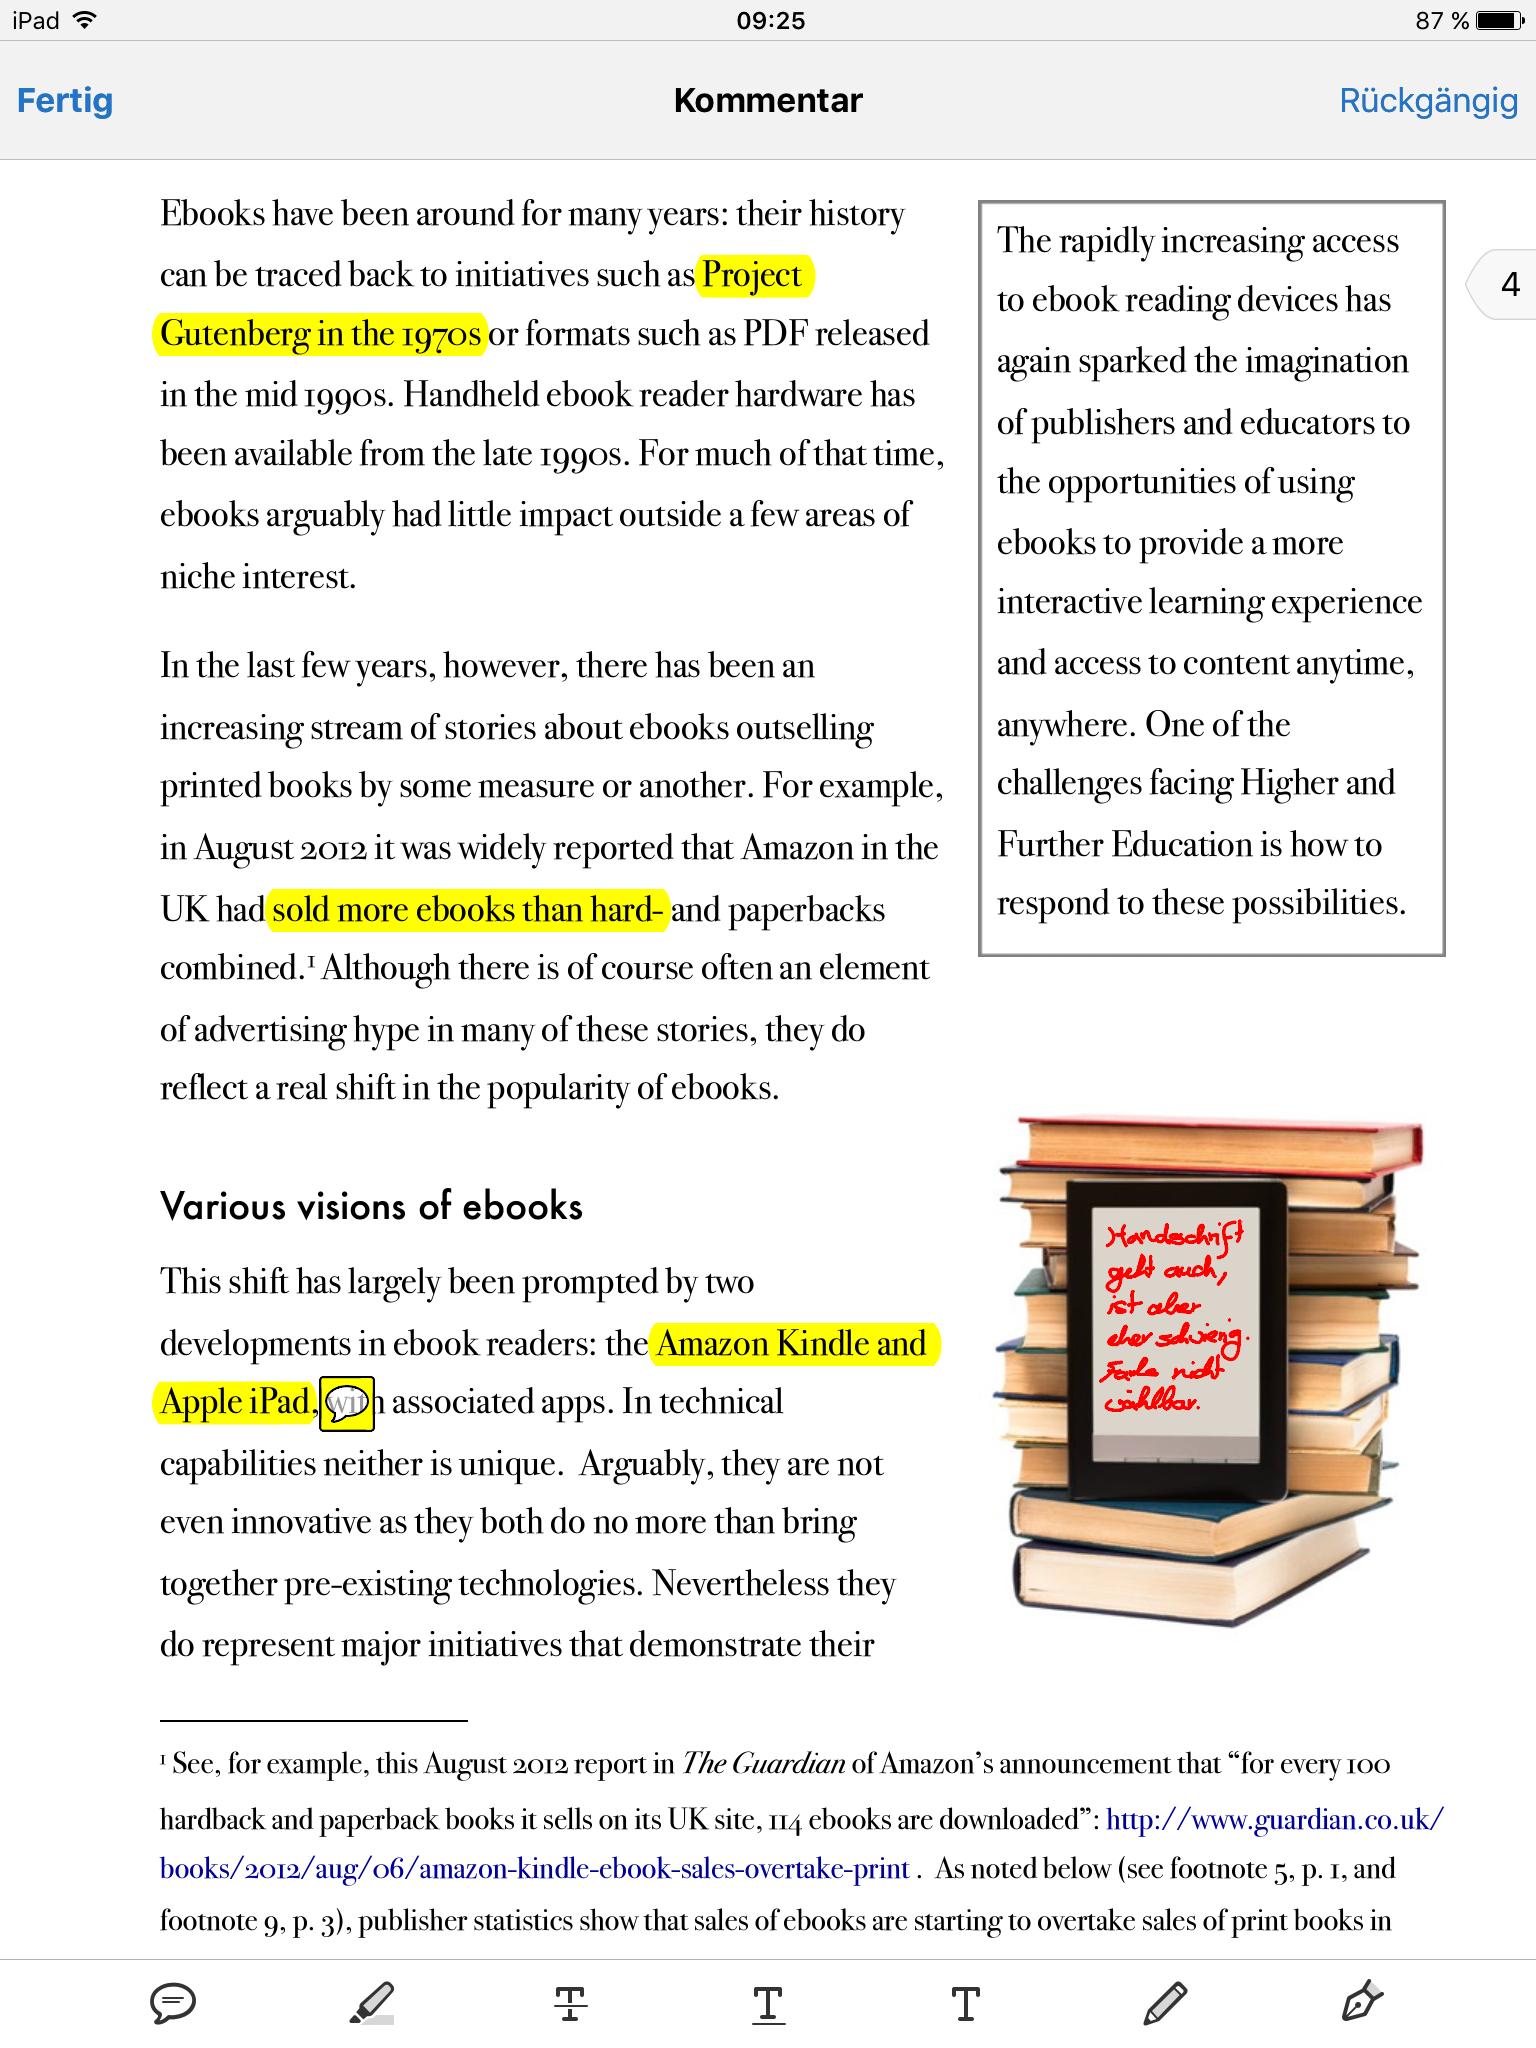 Adobe Reader Annotationen